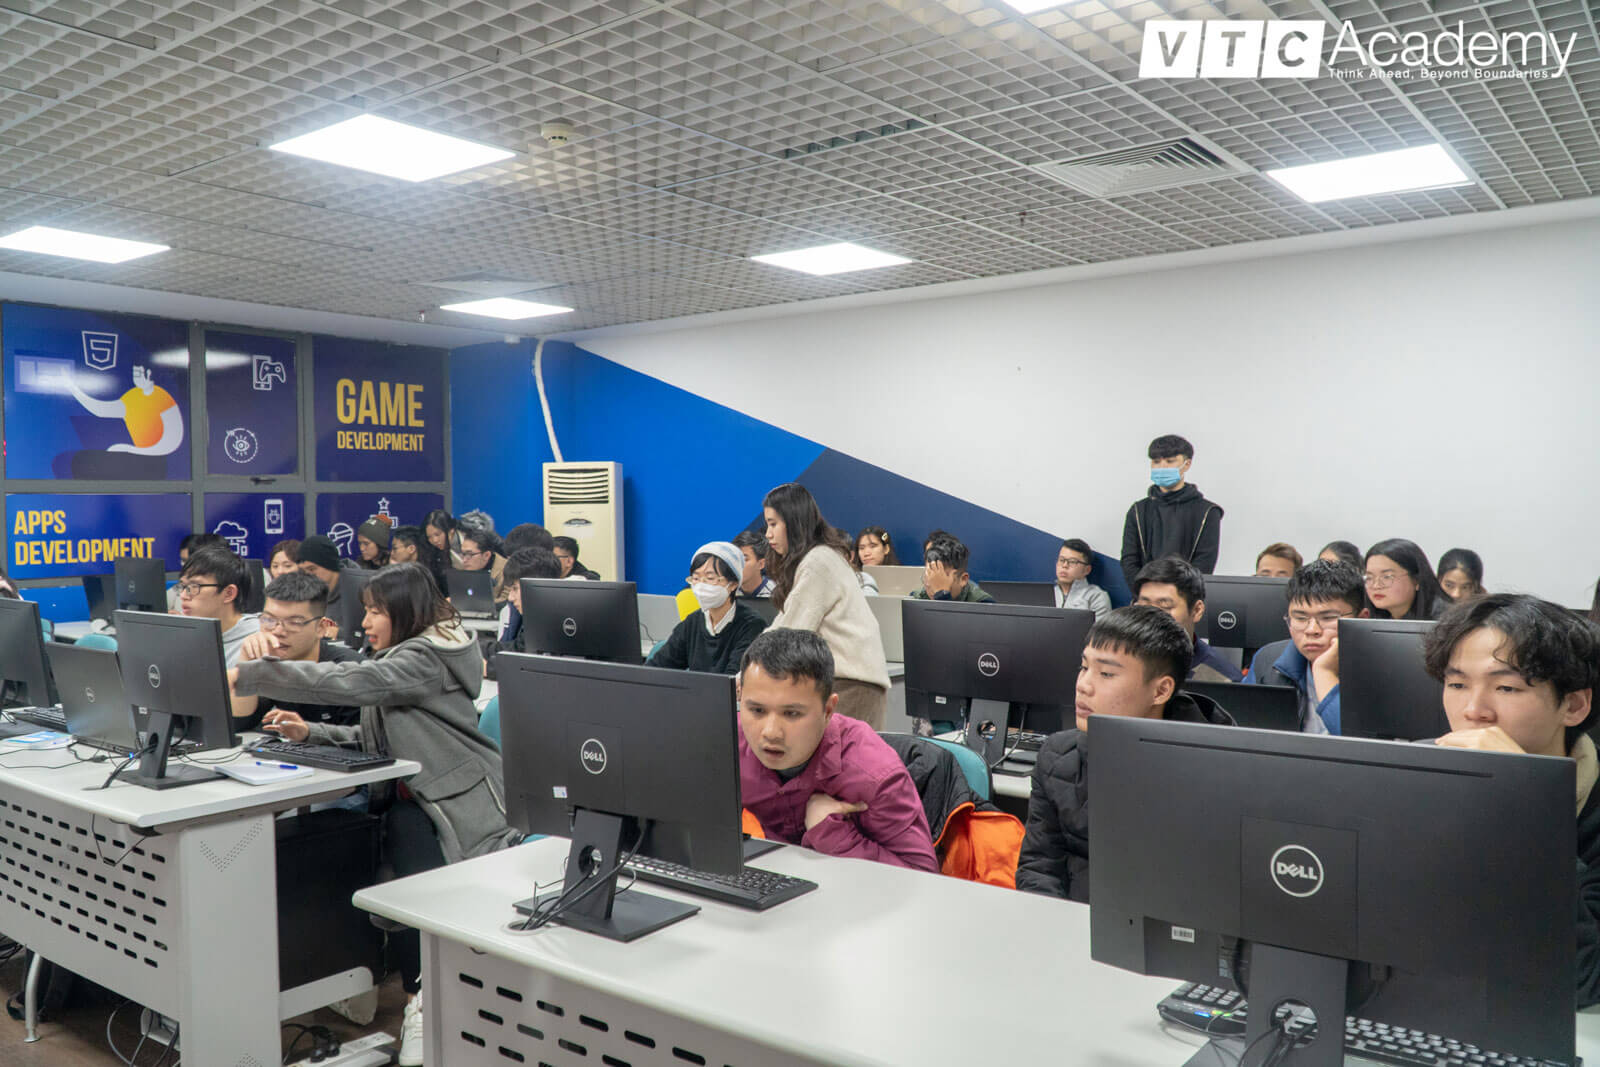 2d-bootcamp-vtc-academy-2